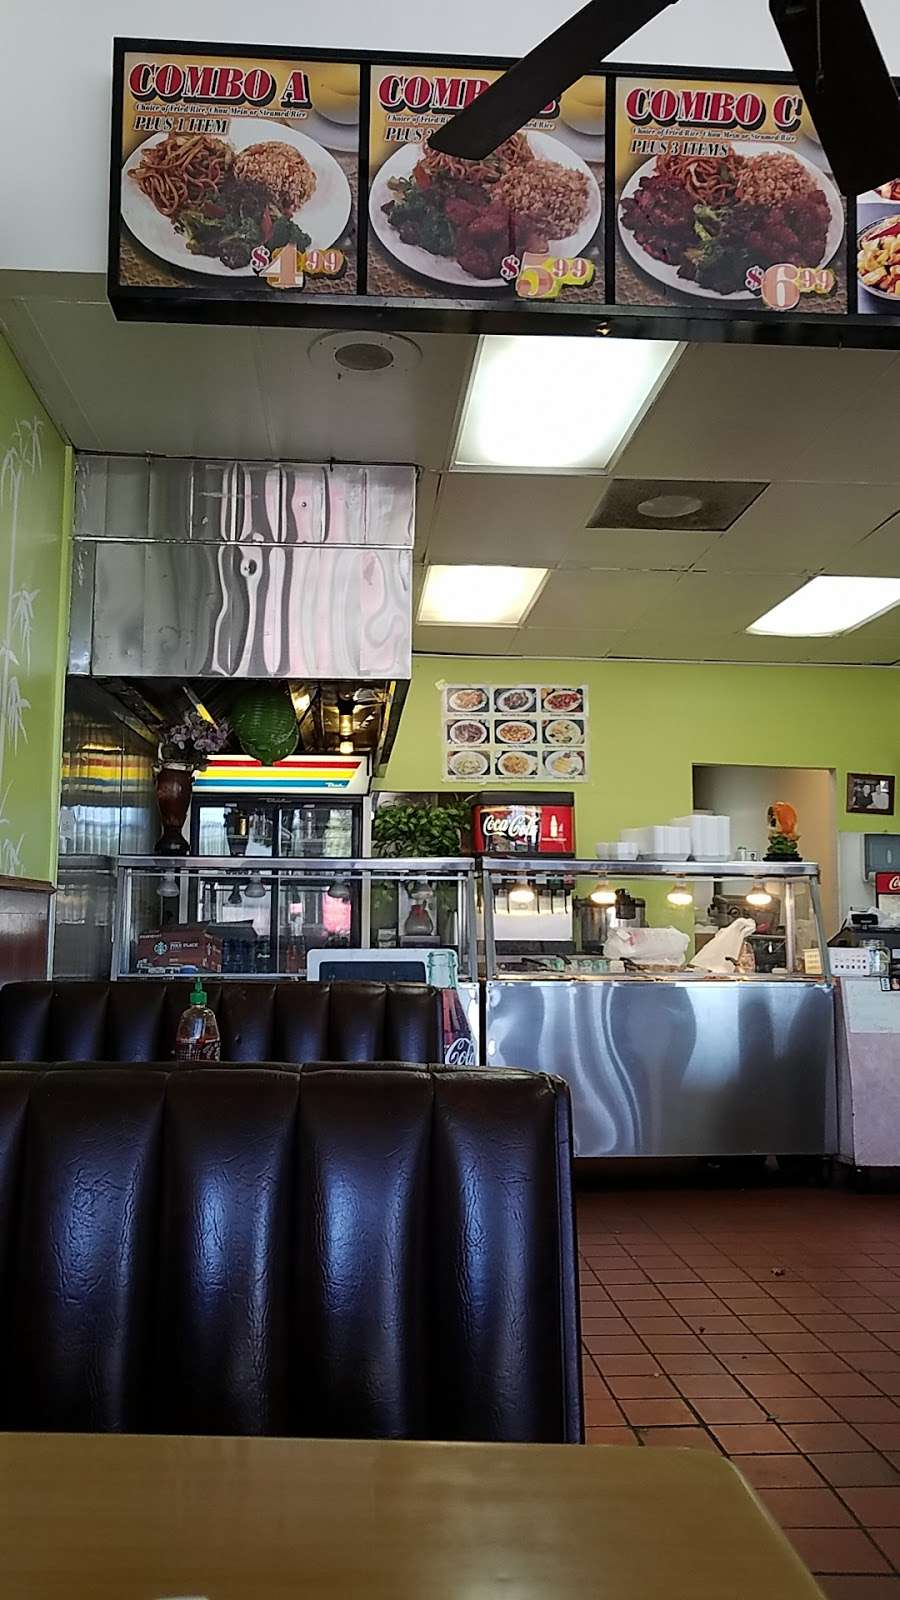 Donuts and Fast Chinese Food - restaurant  | Photo 3 of 10 | Address: 1032 E Avenida De Los Arboles, Thousand Oaks, CA 91360, USA | Phone: (805) 241-7761